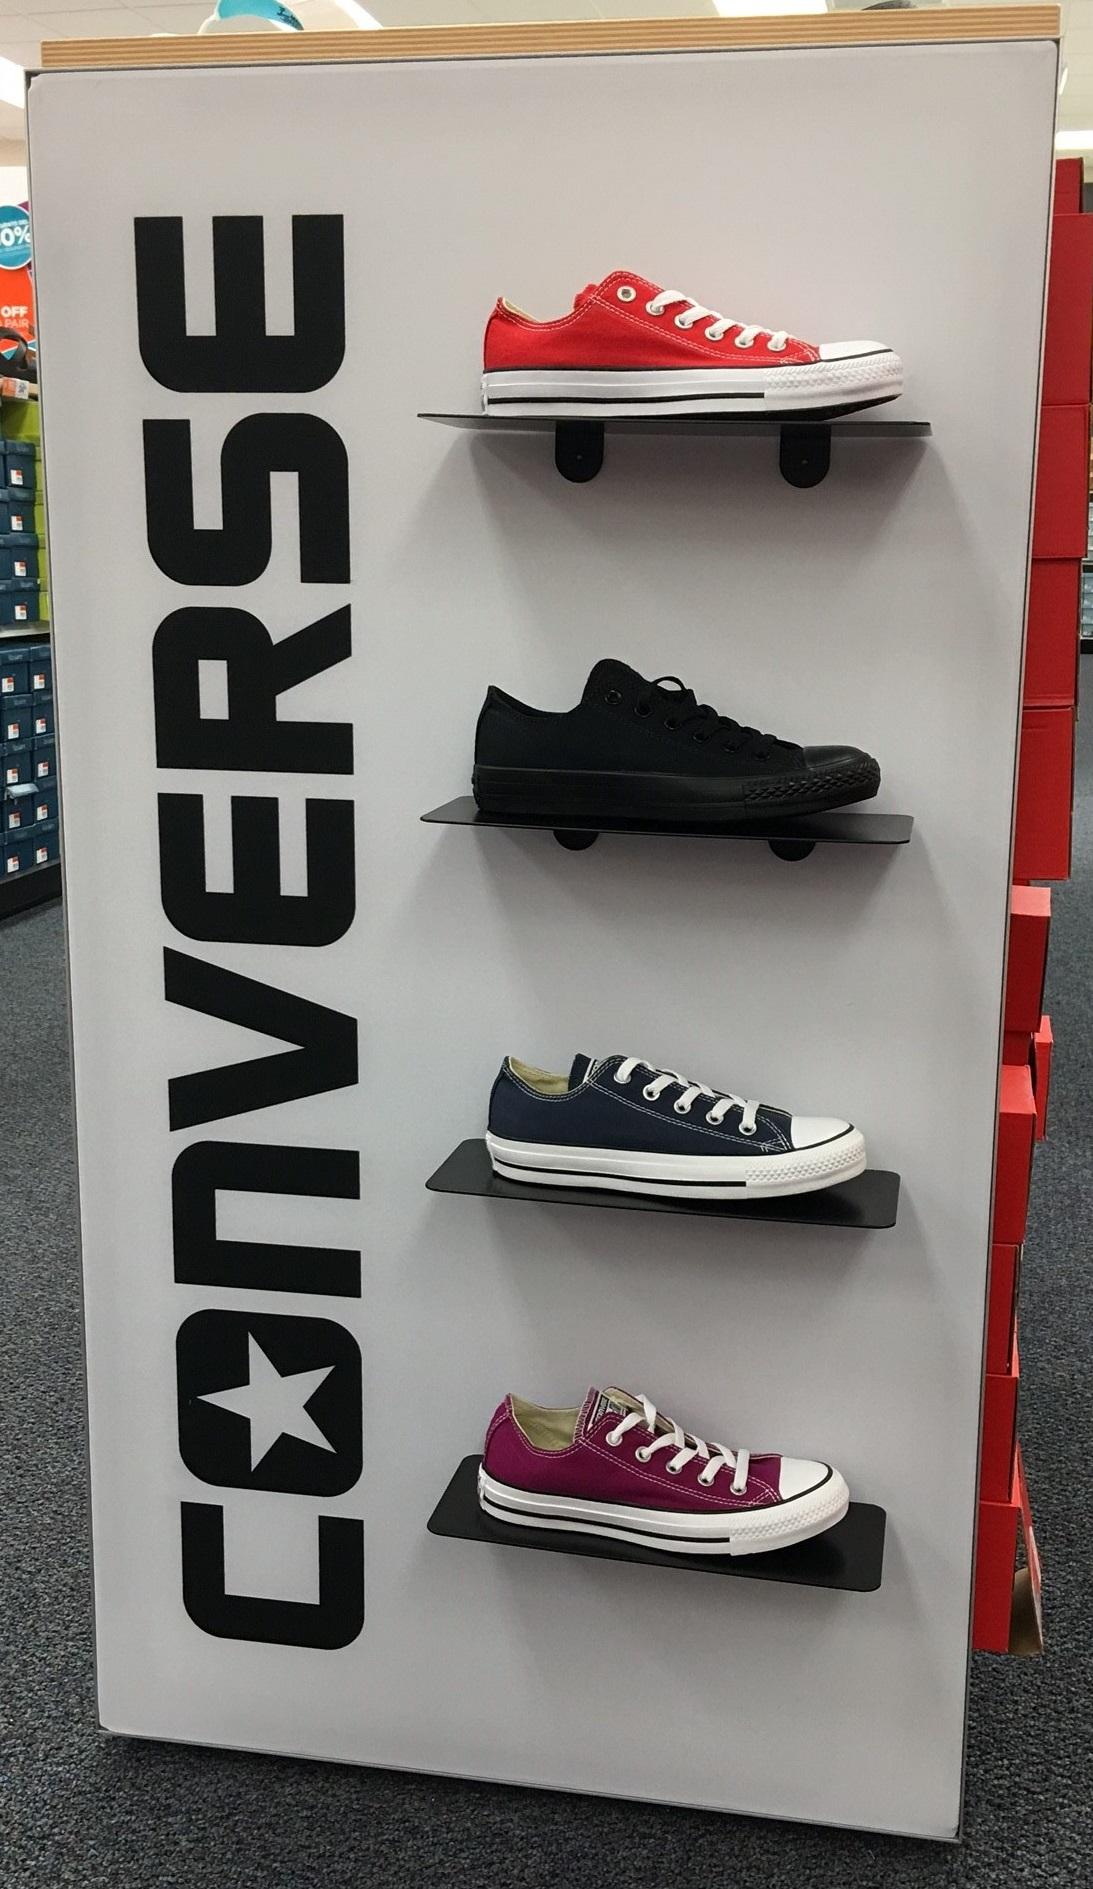 Converse Shoe Display